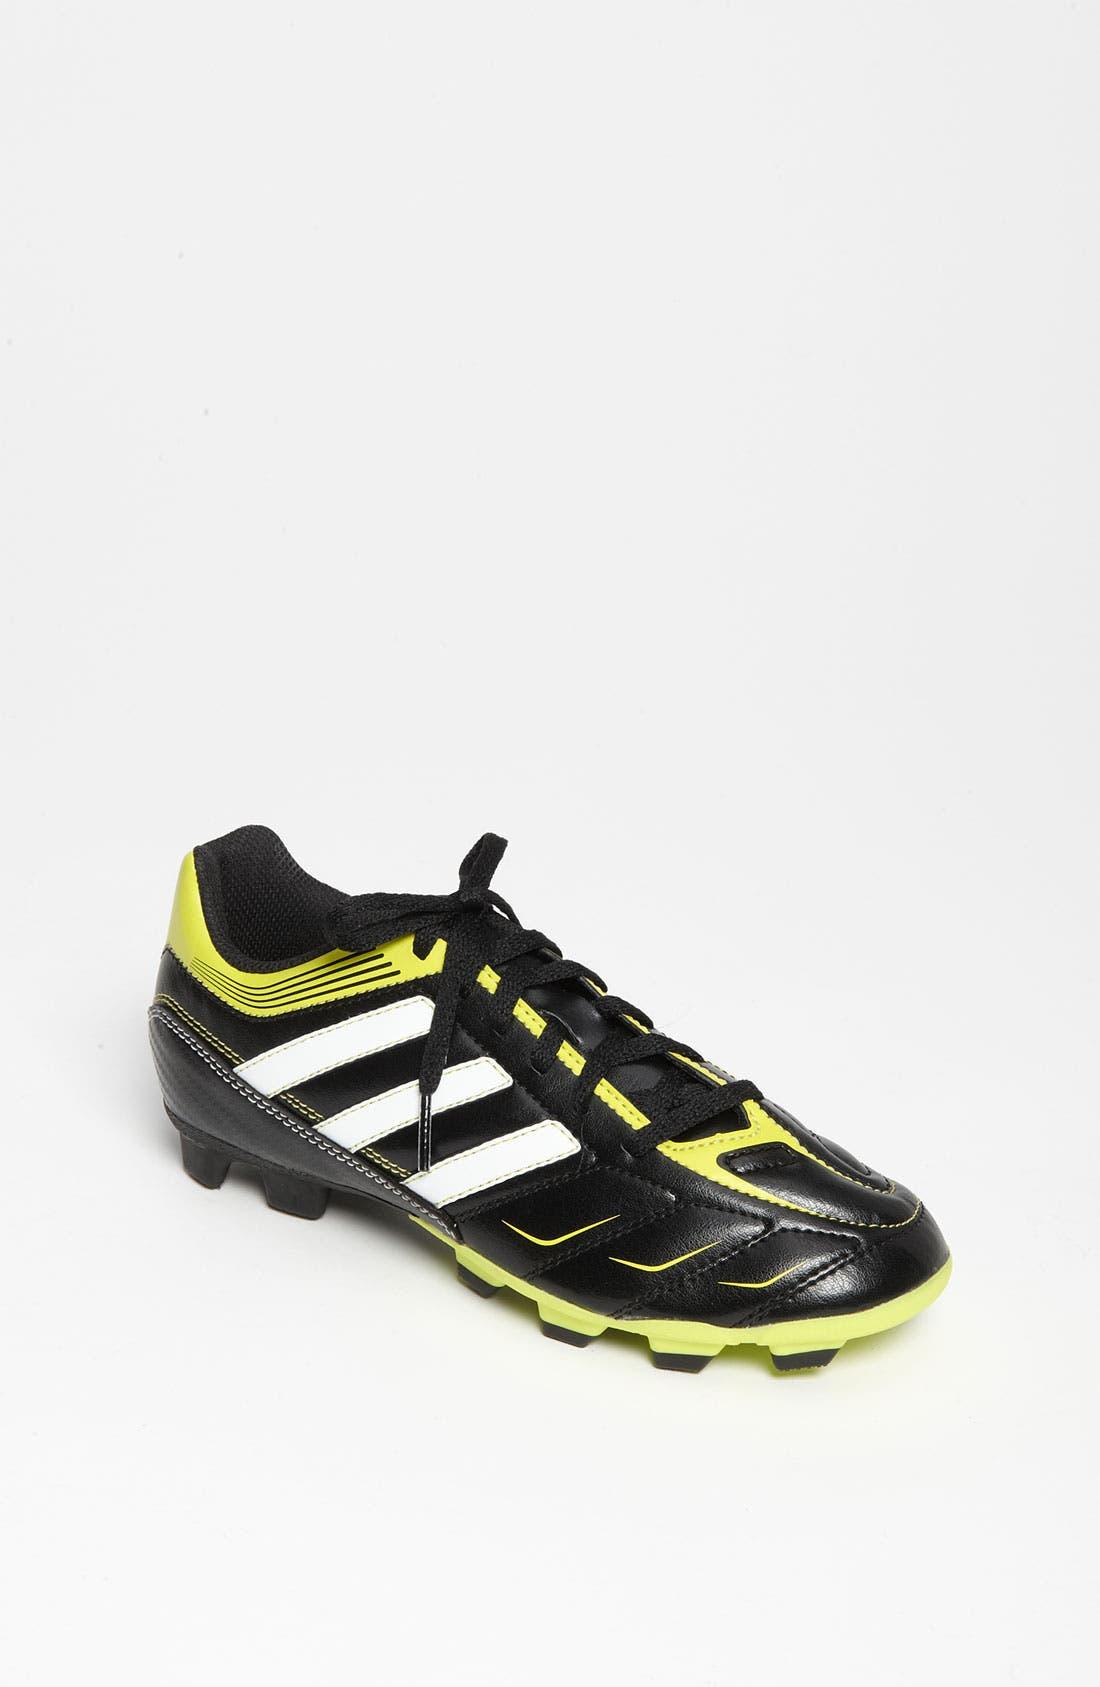 Main Image - adidas 'Eziero' Soccer Shoe (Little Kid & Big Kid)